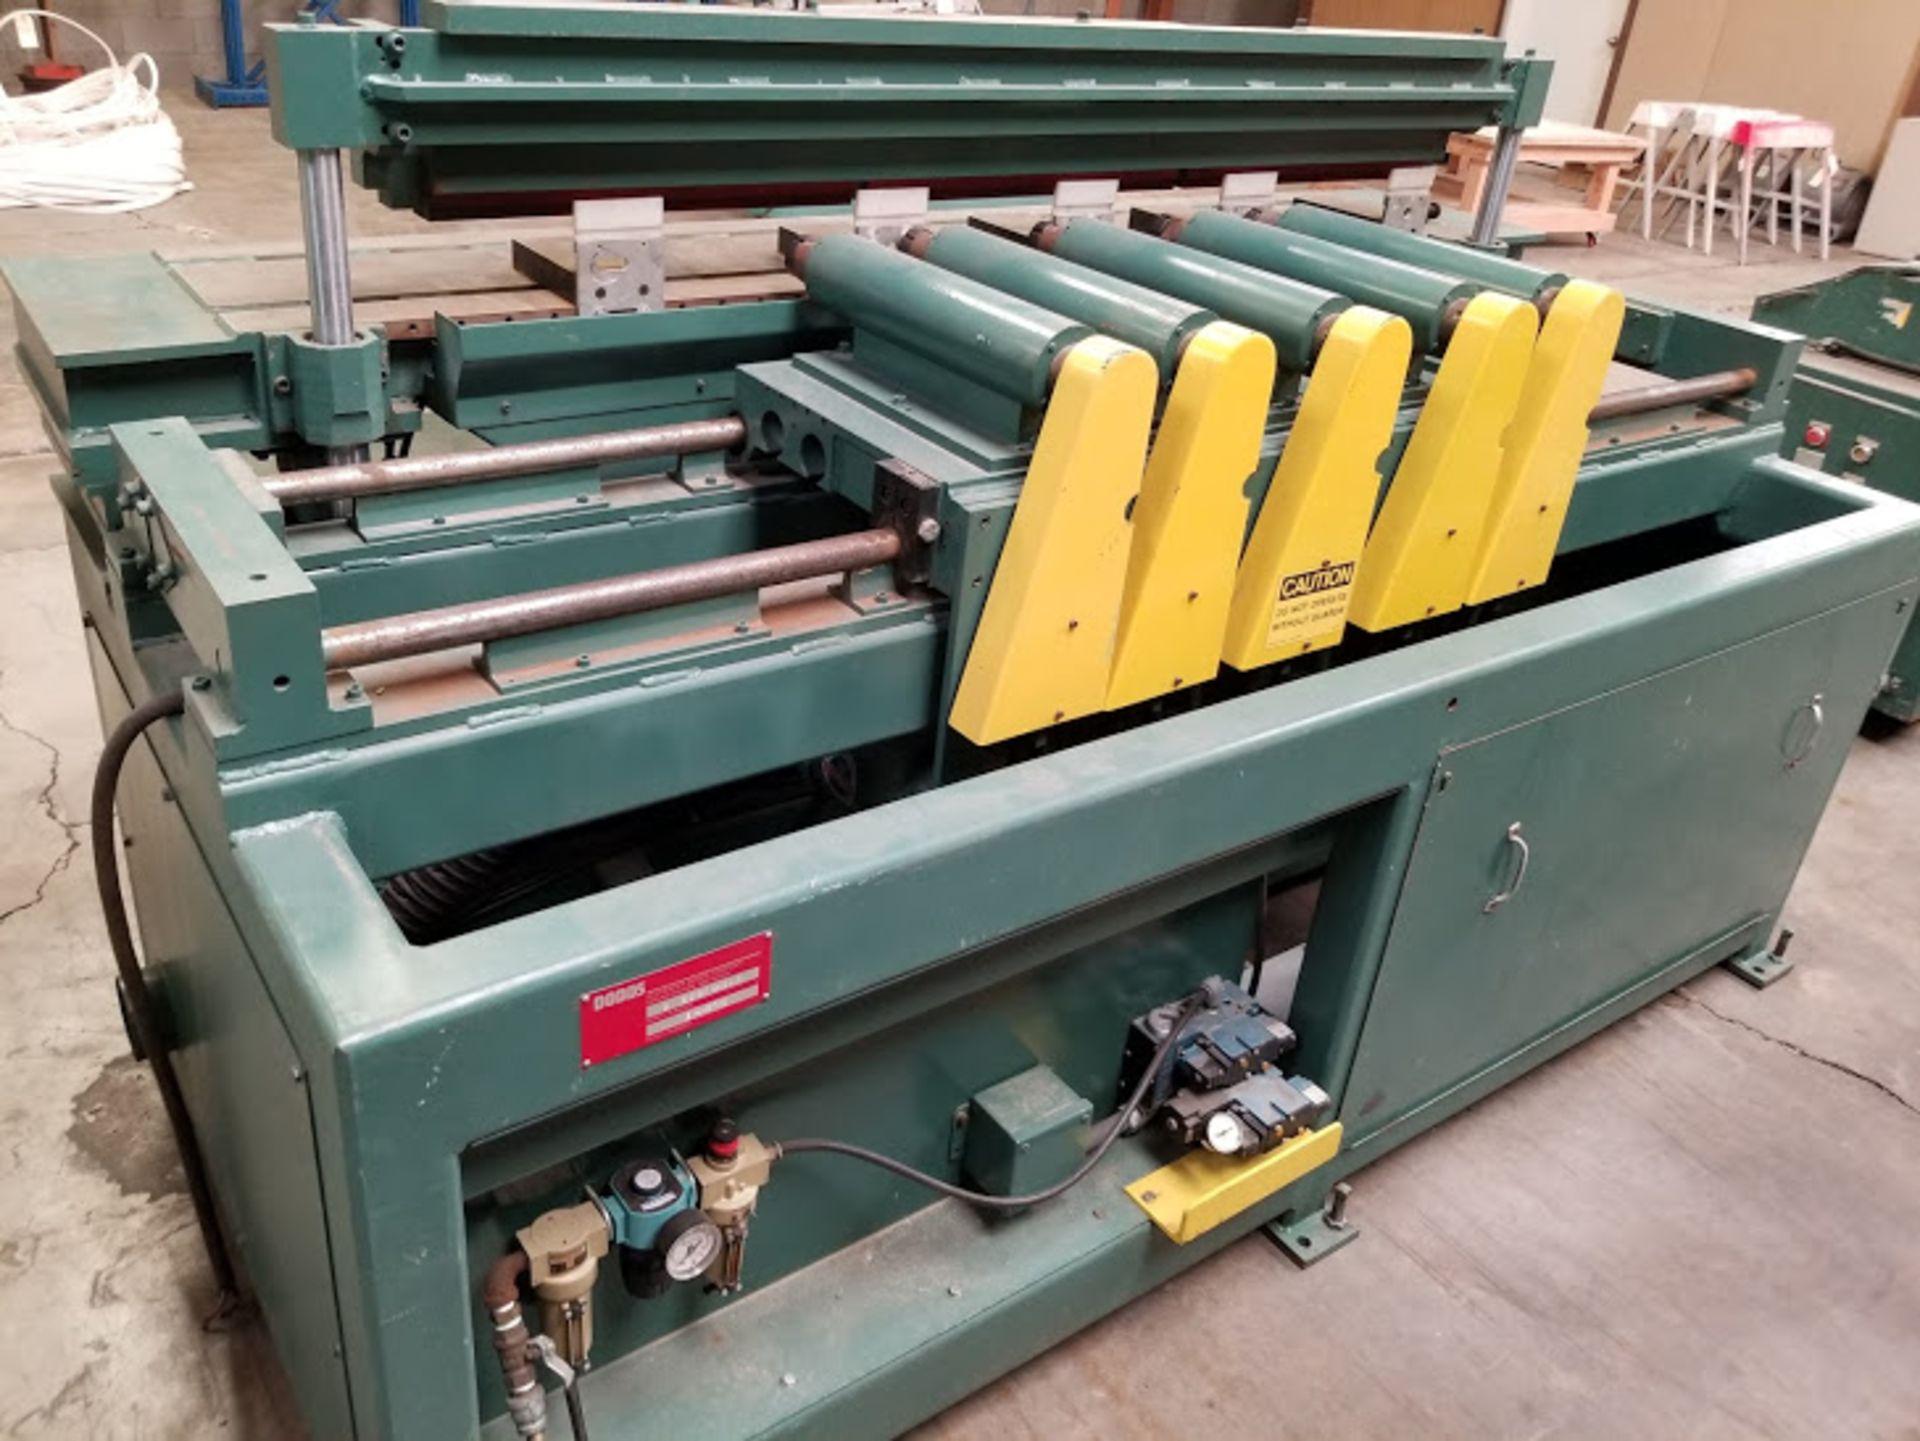 Dodds 5-Spindle Boring Machine, Model: B-802 Baldor 1.5HP 208-230/460 Volts (5 Motors) - Image 5 of 6